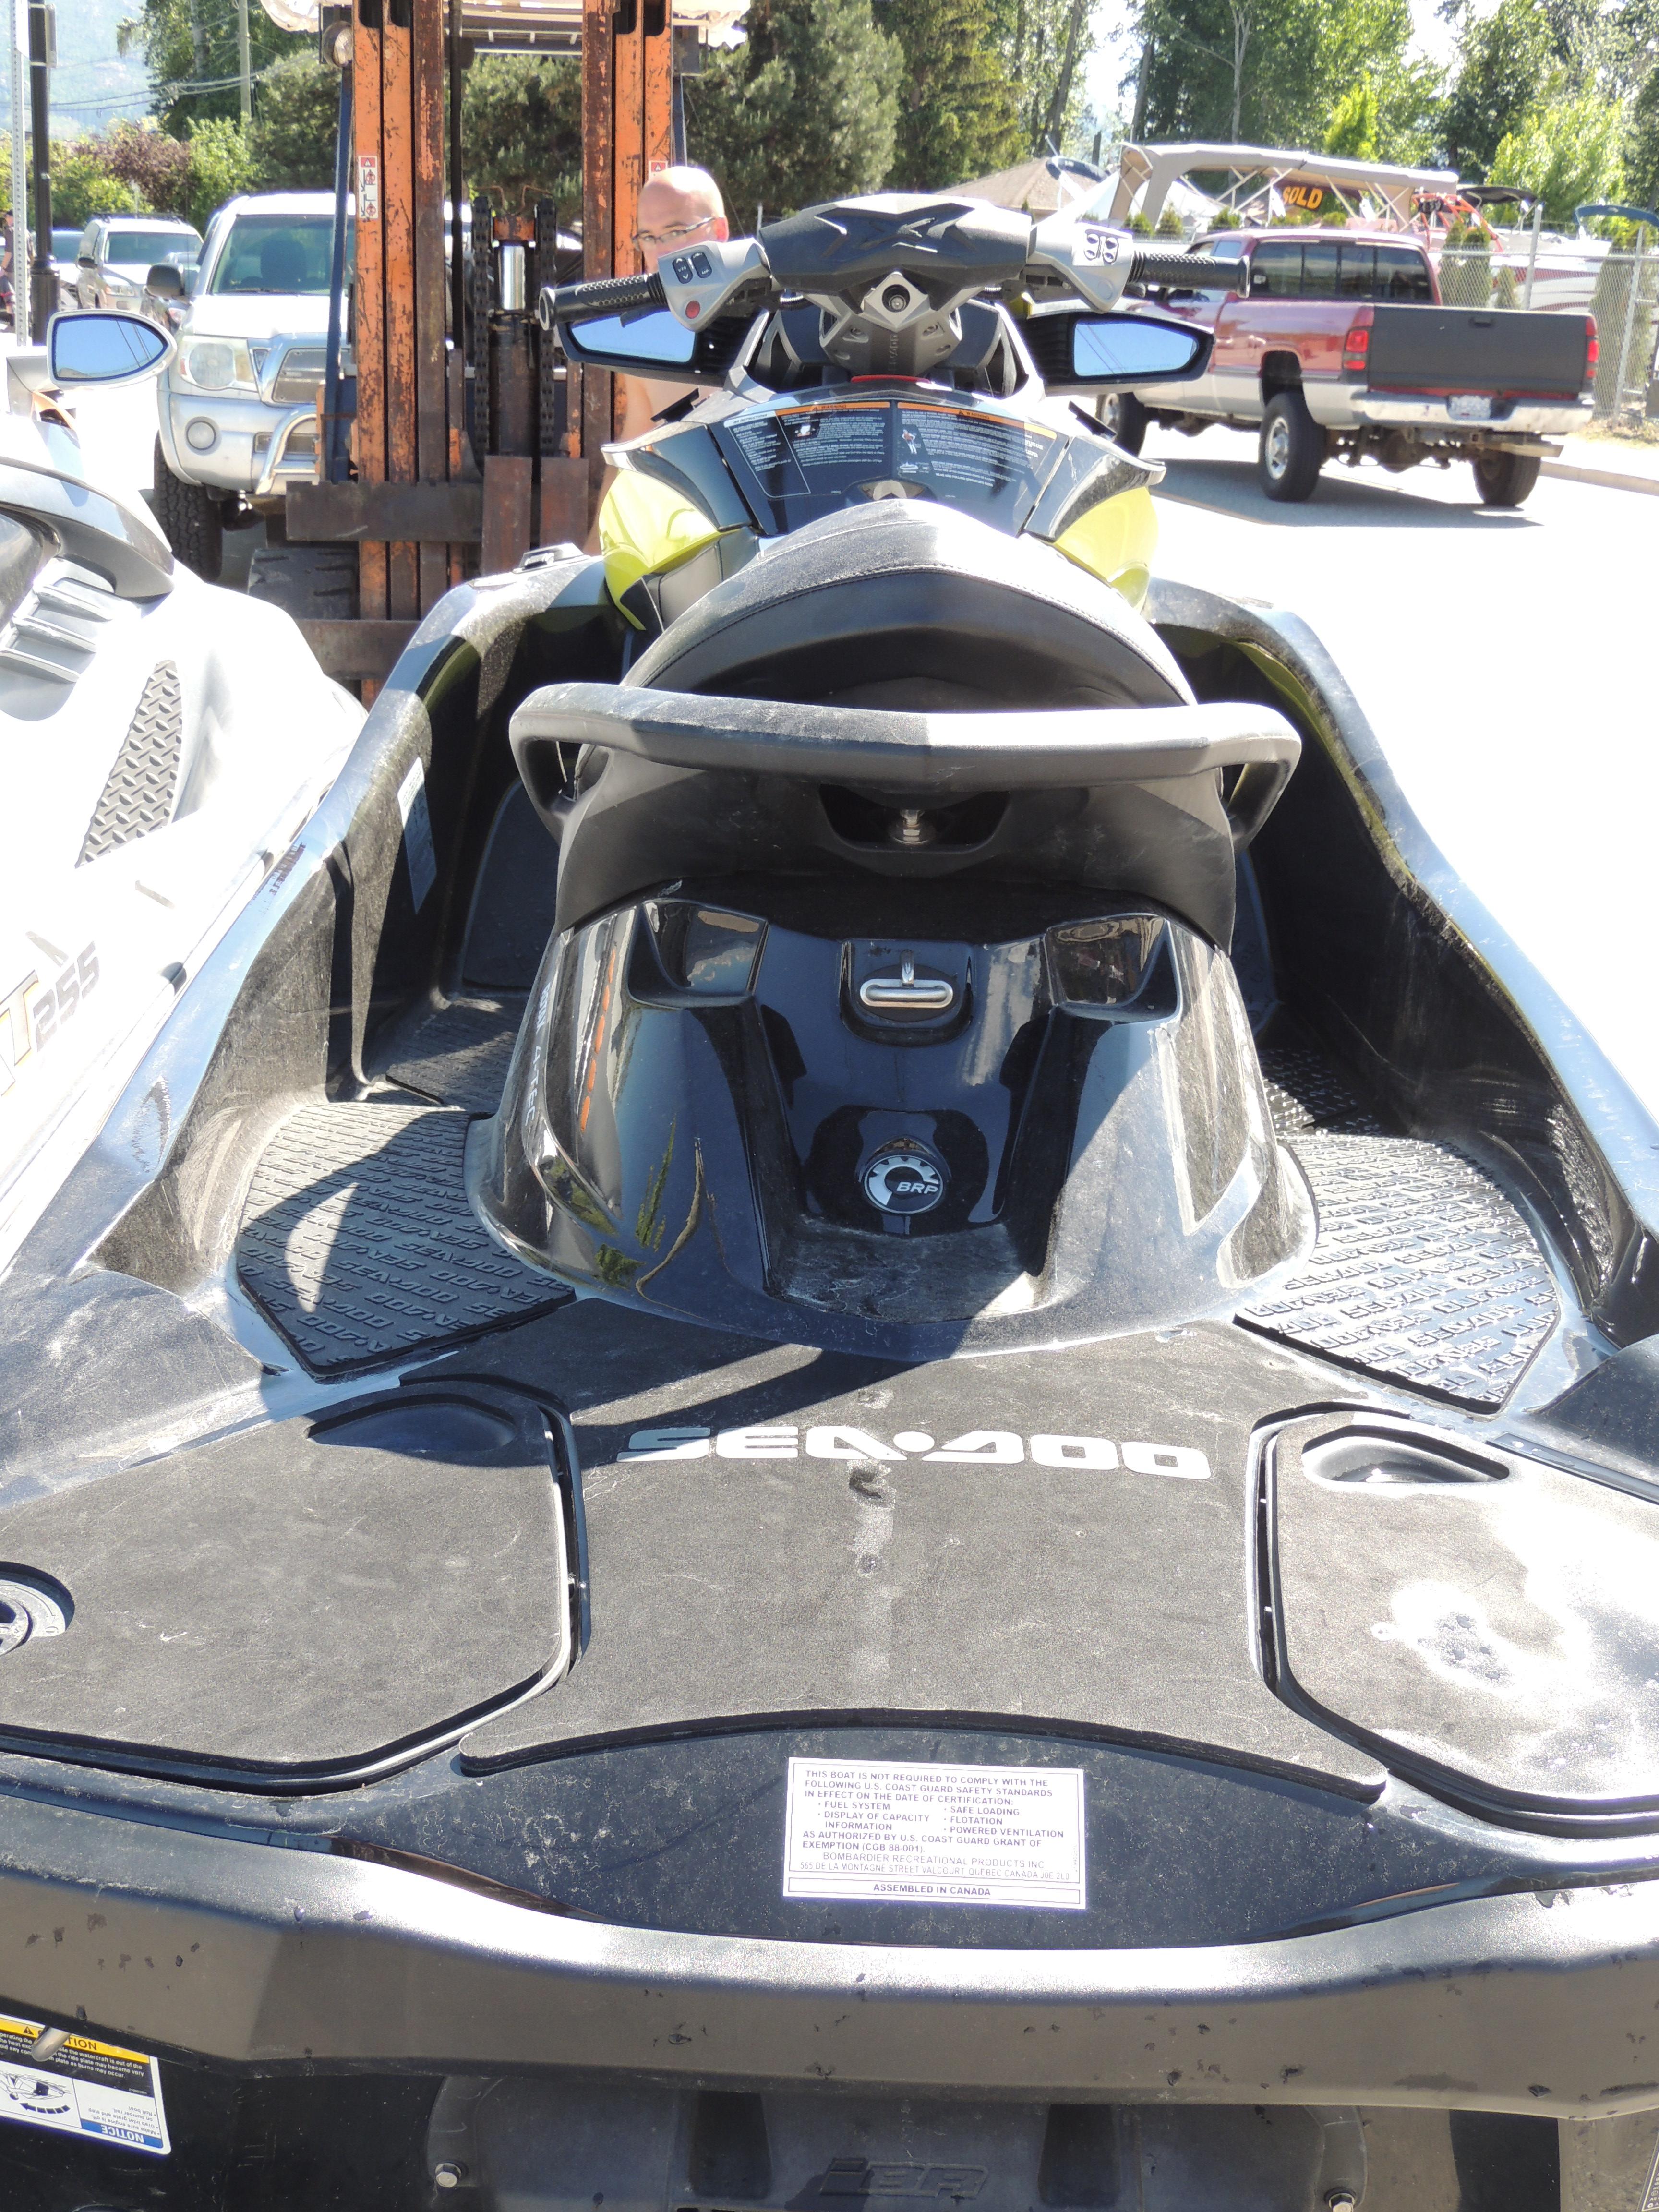 2012 Seadoo RXTX260